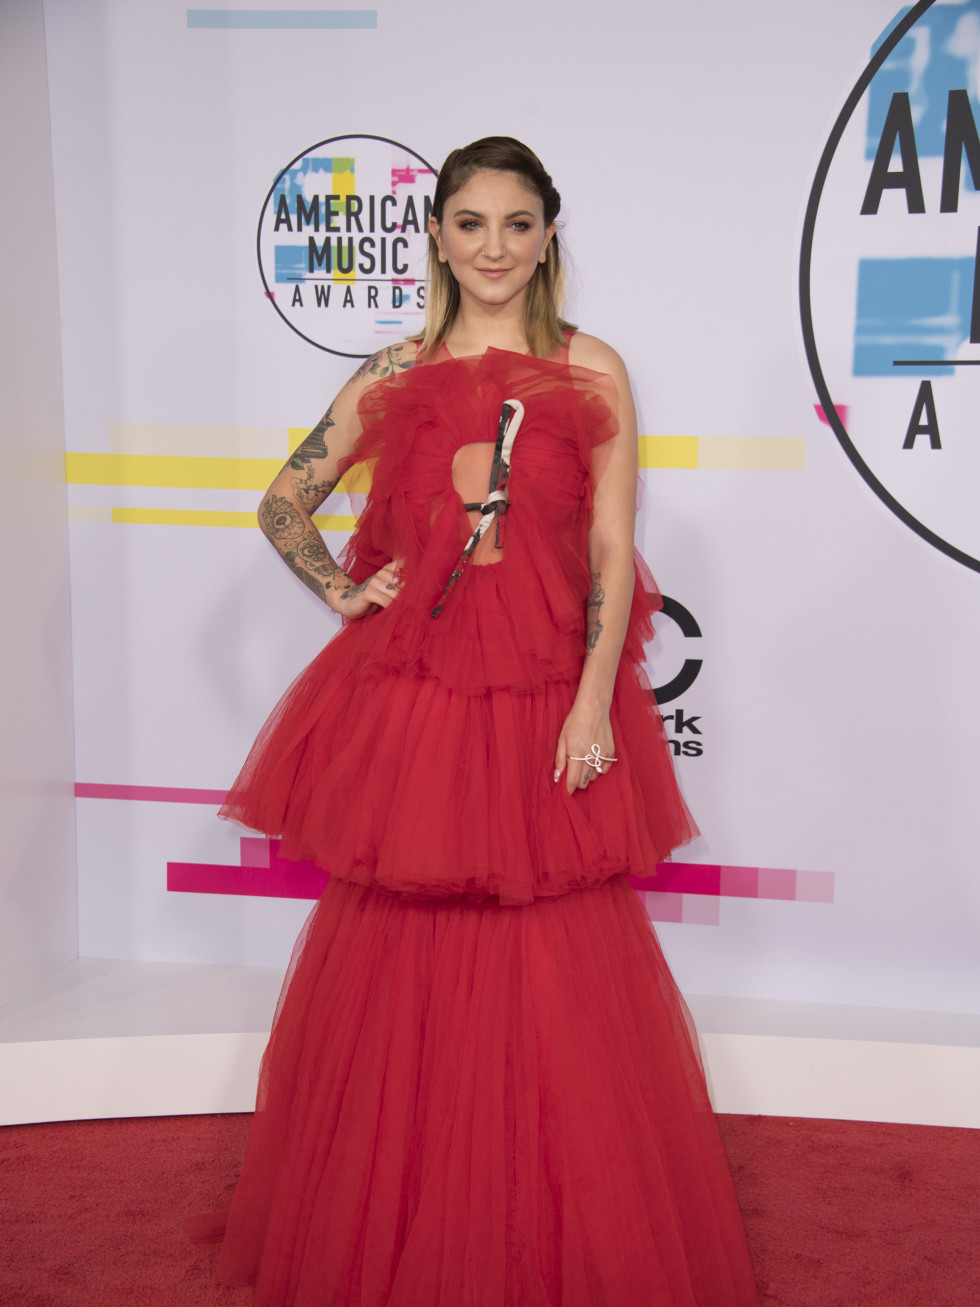 American Music Awards Julia Michaels